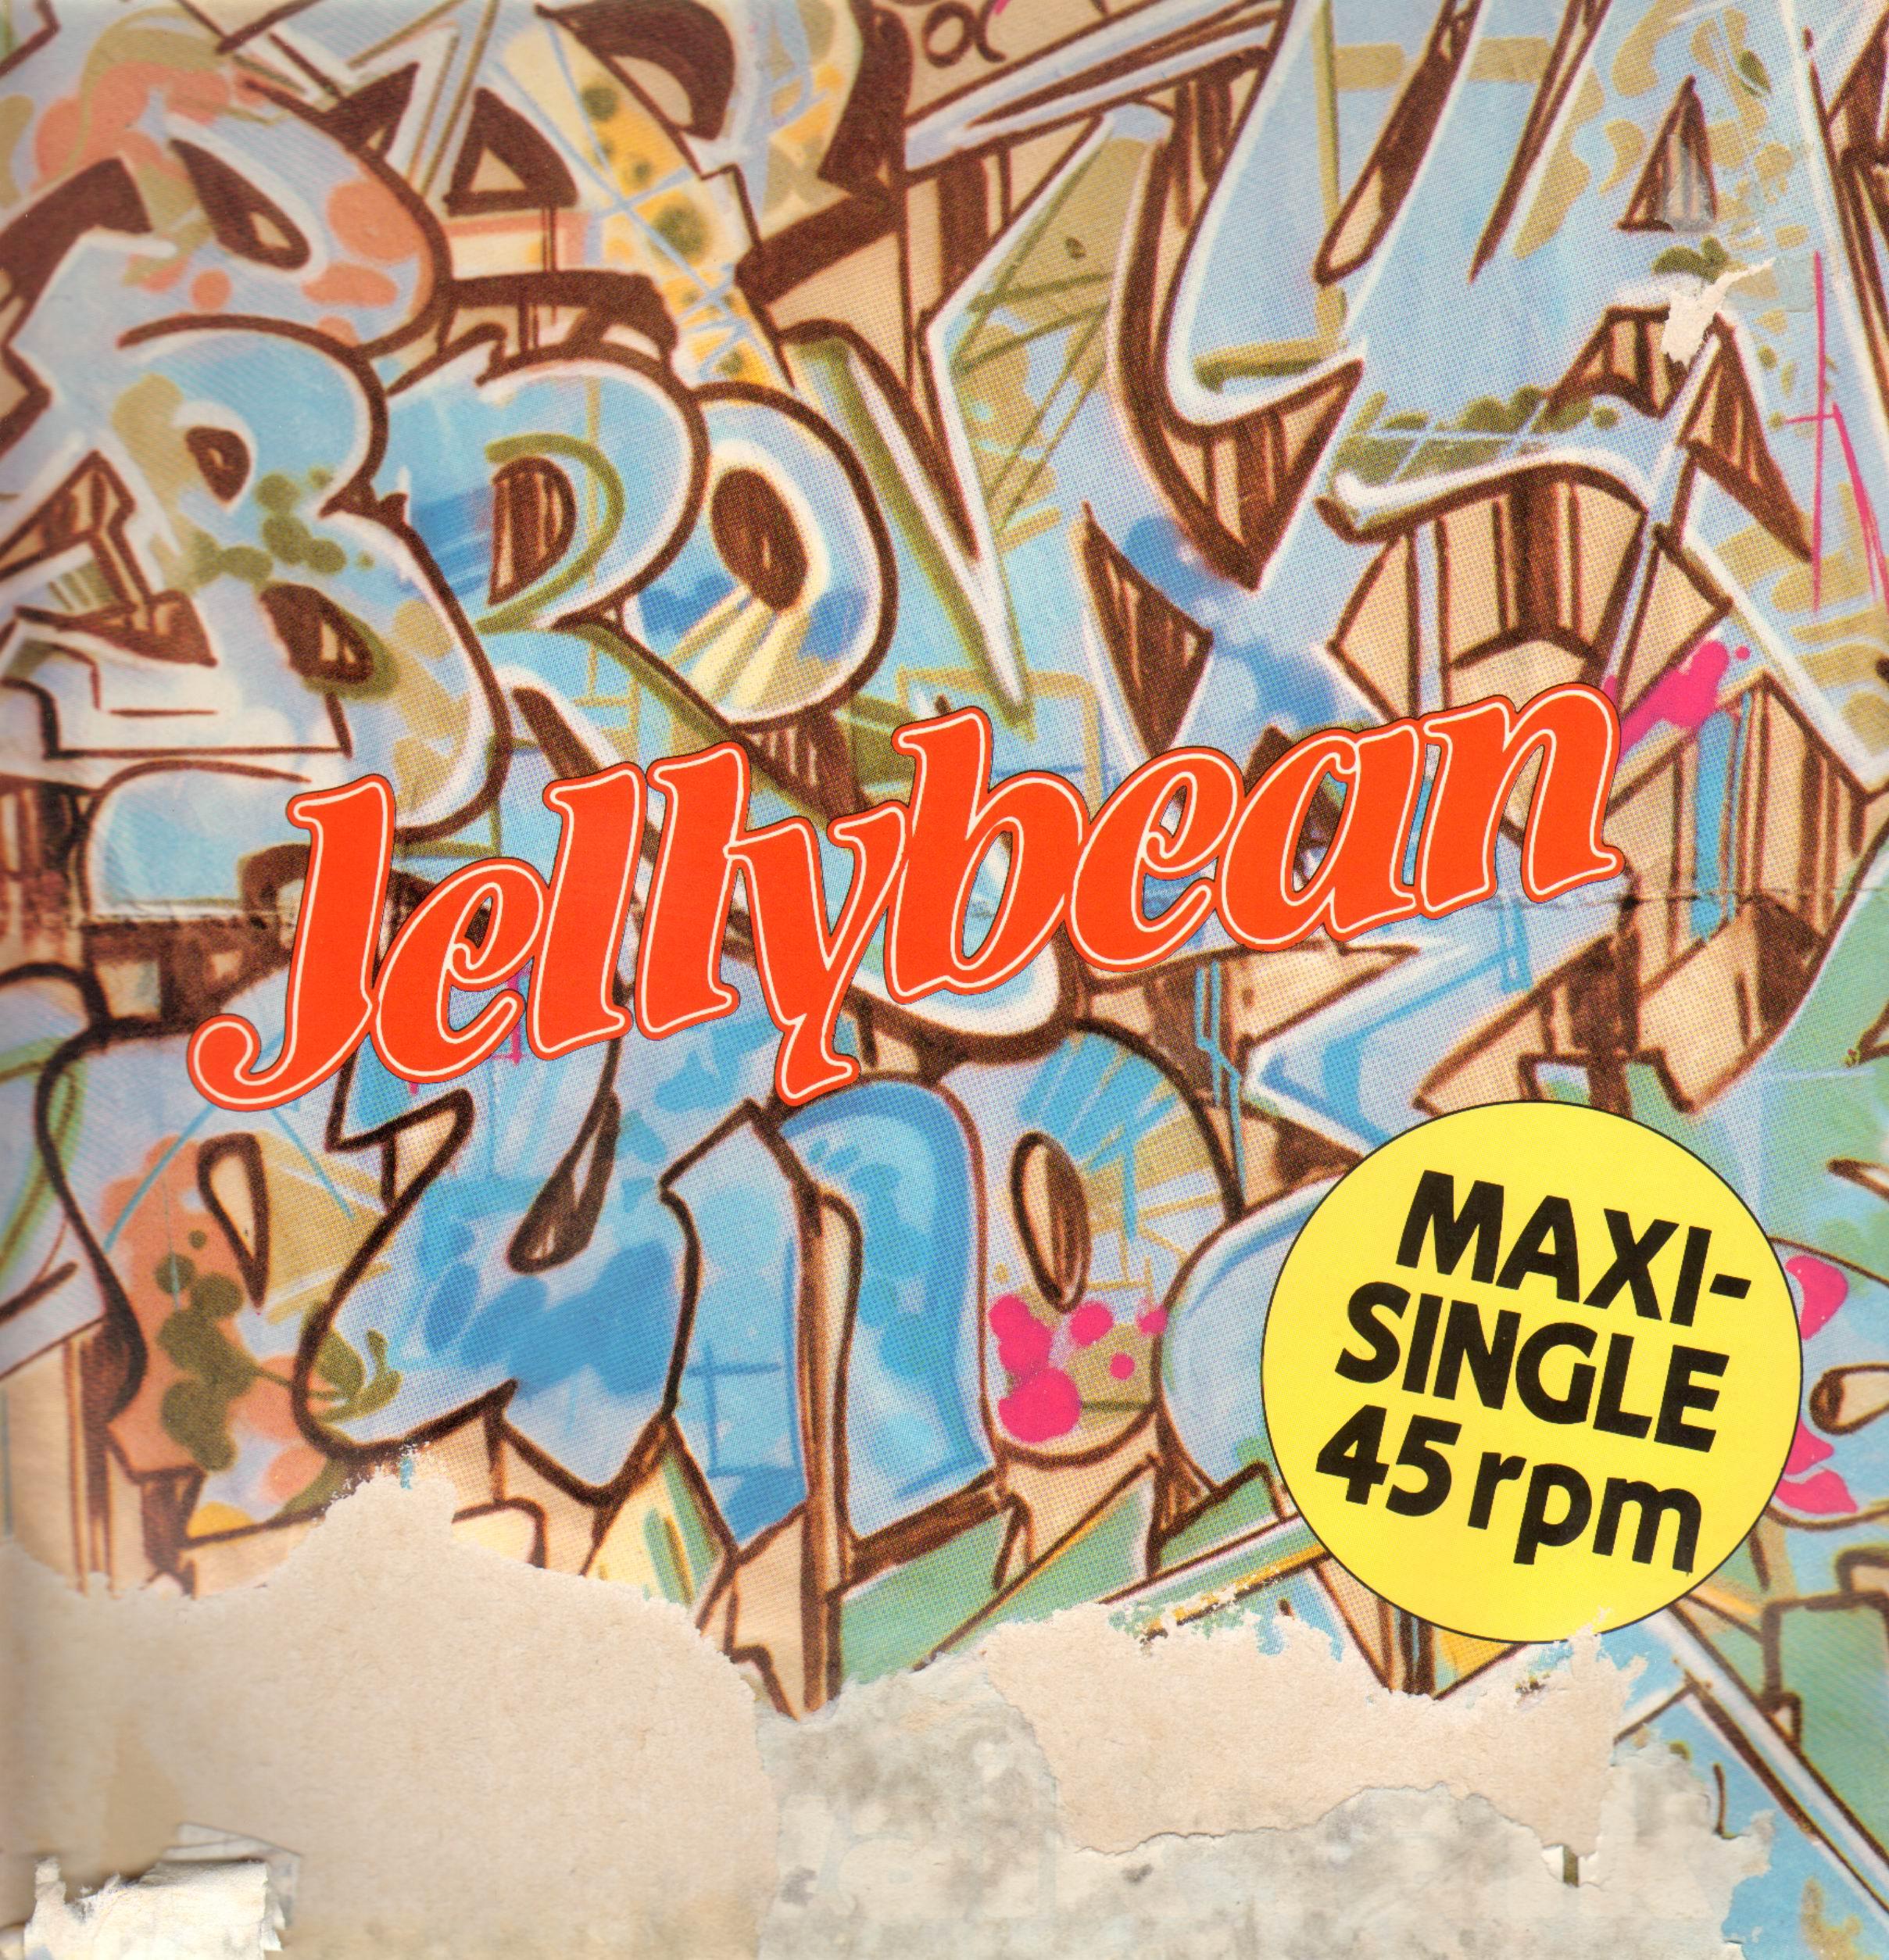 jellybean sideway talk